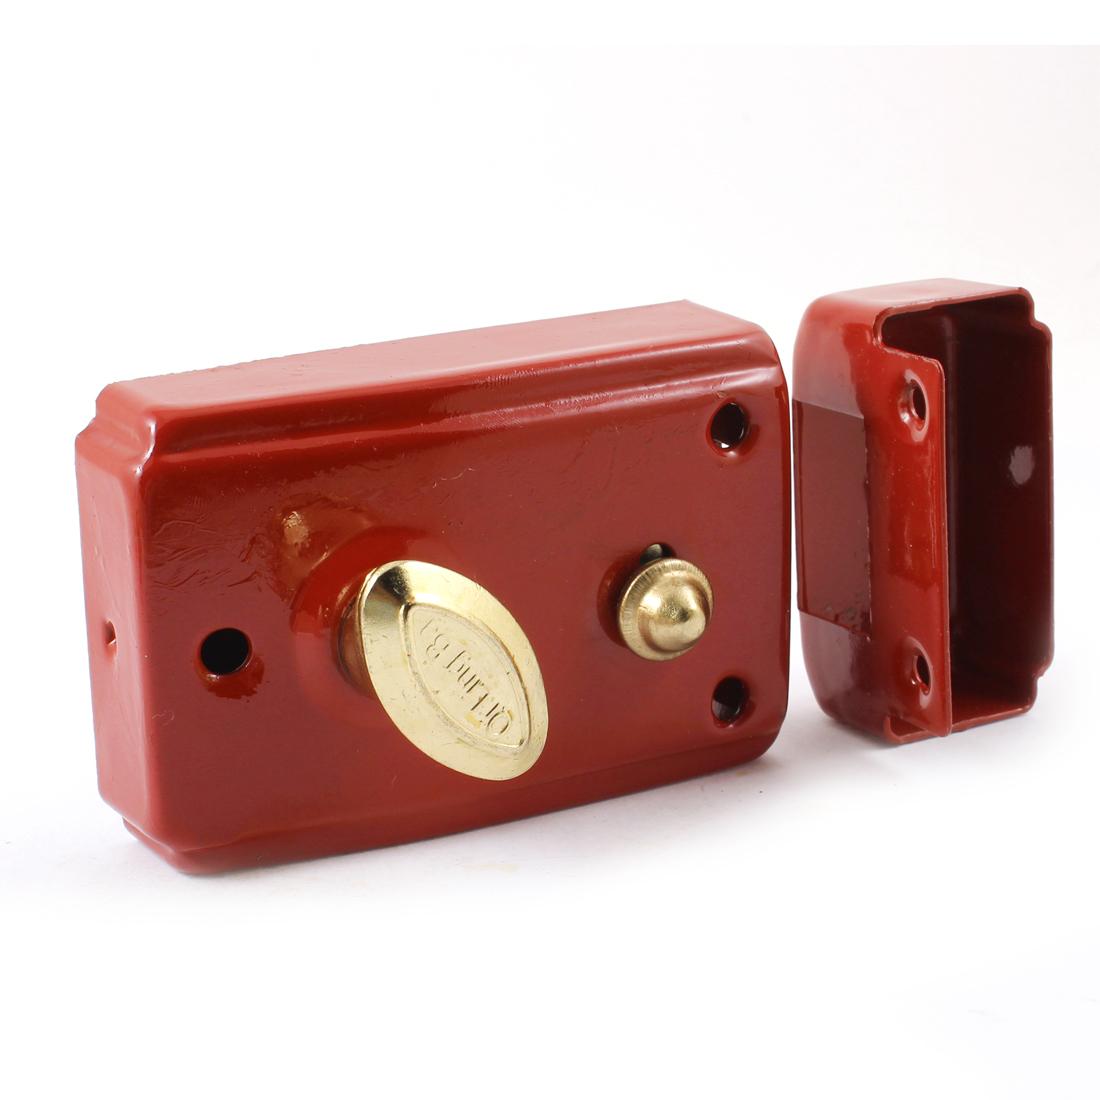 Dormitory Repairing Part Door Locks with keys Red Security Single Bolt Latch